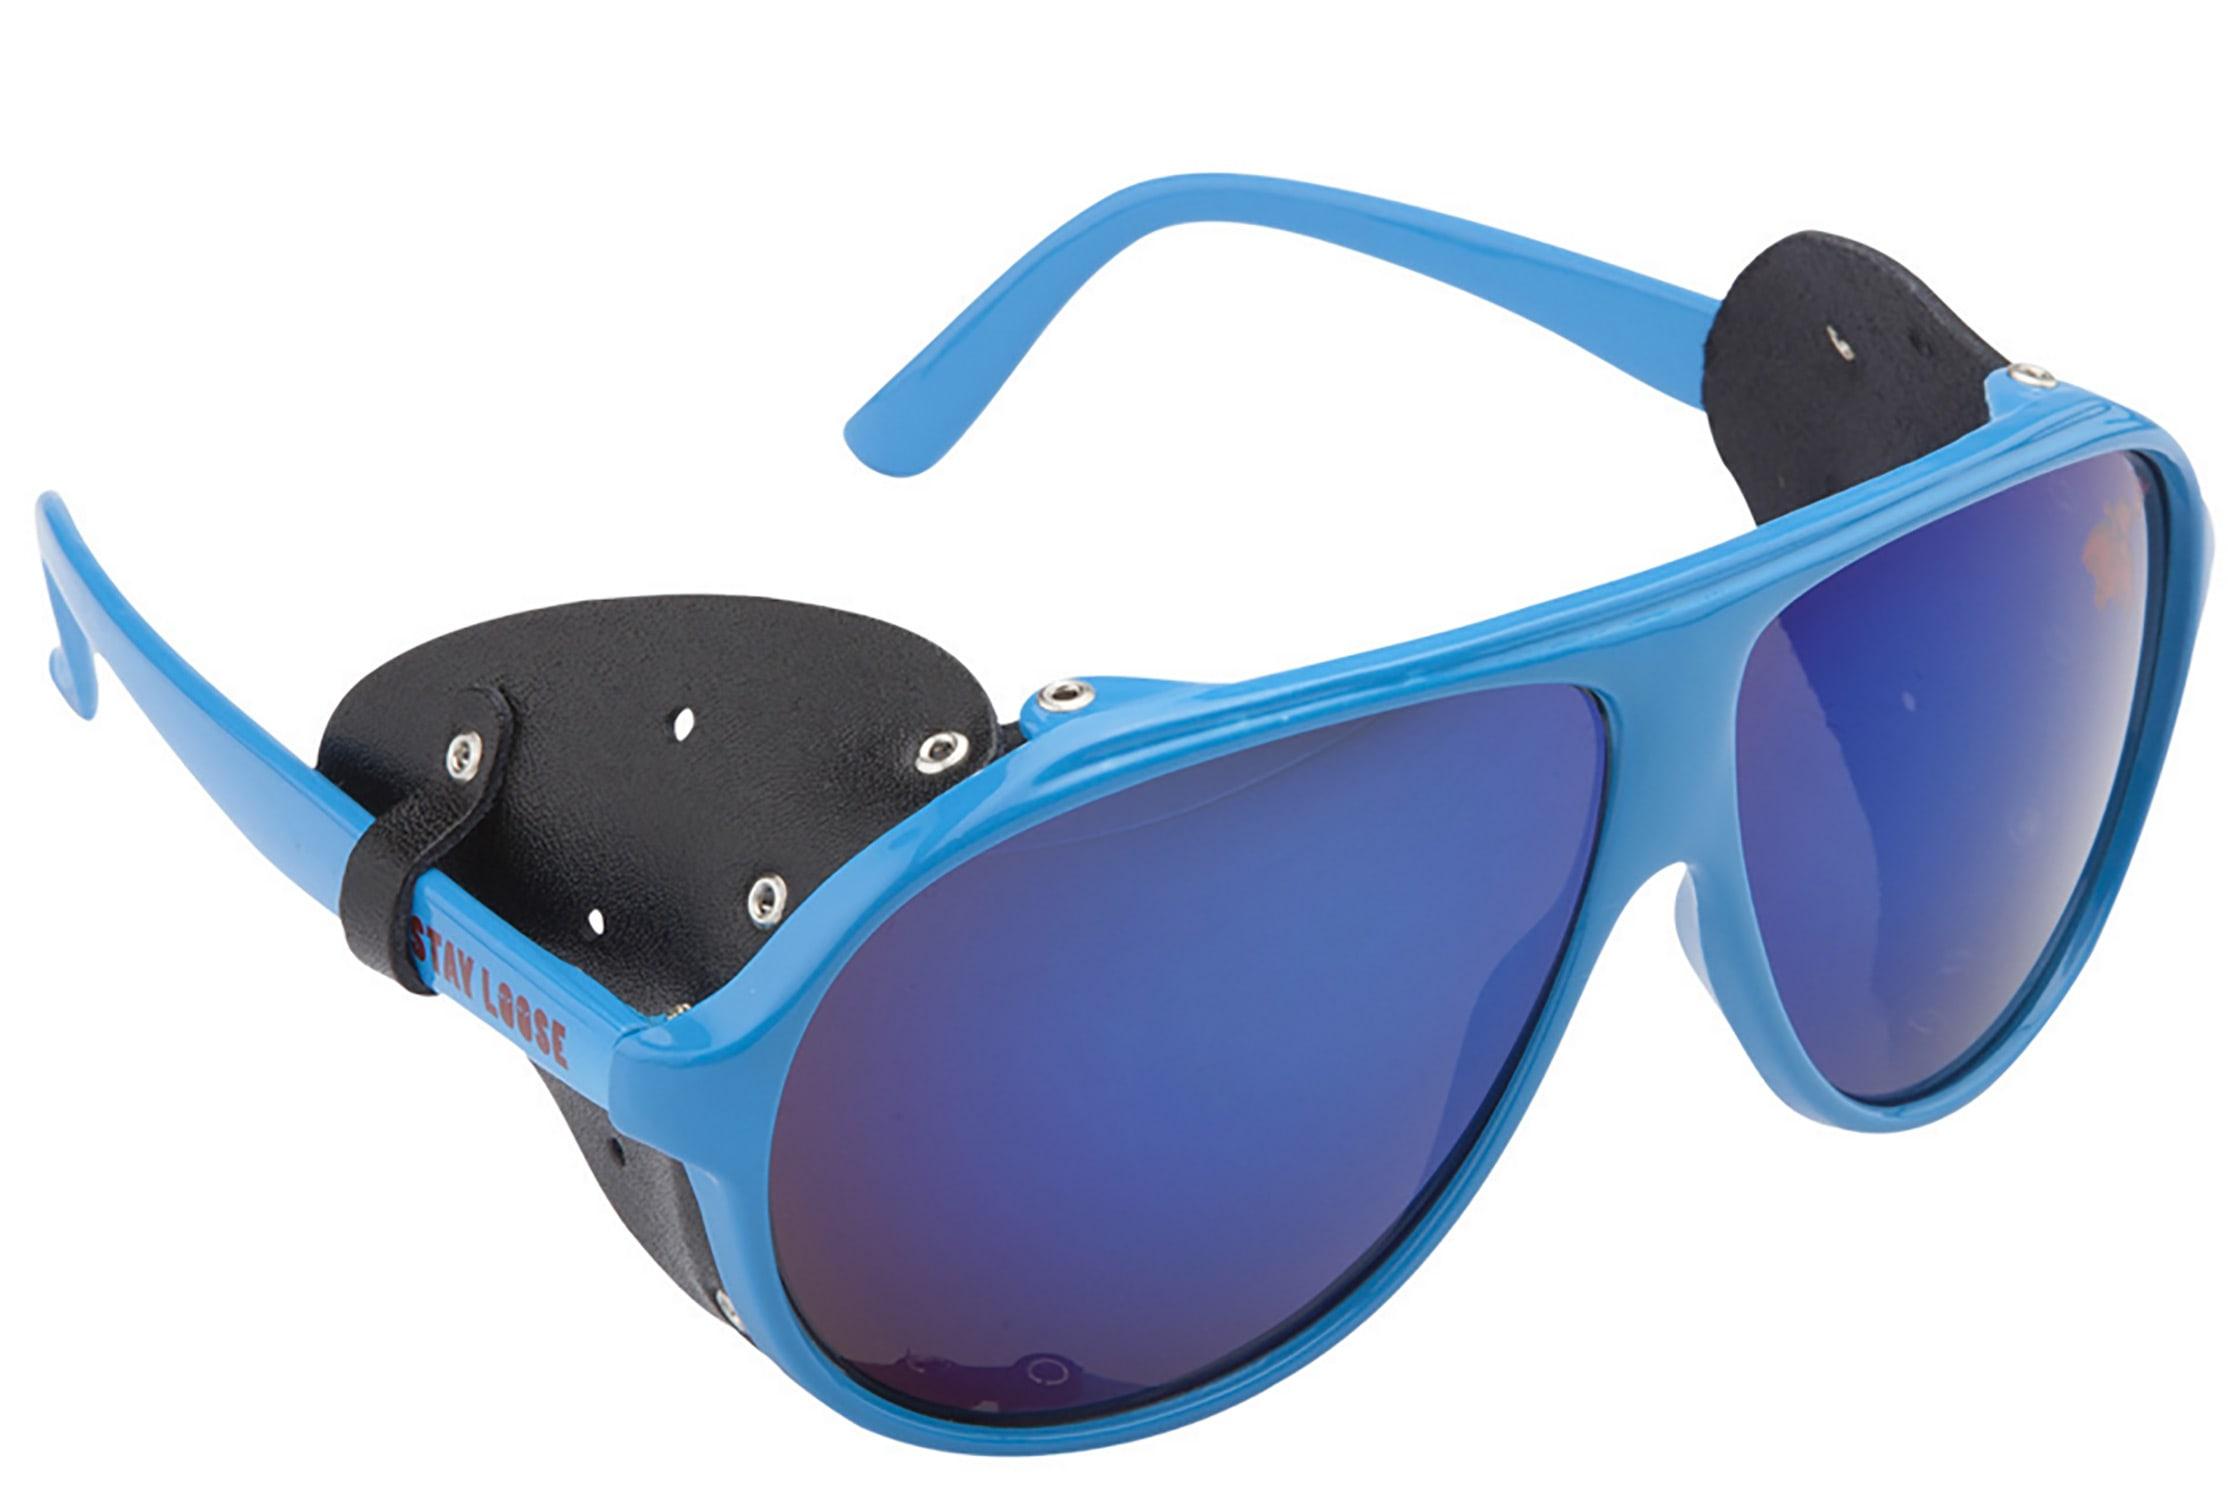 40eabd26709 Airblaster Glacier Sunglasses - thumbnail 1